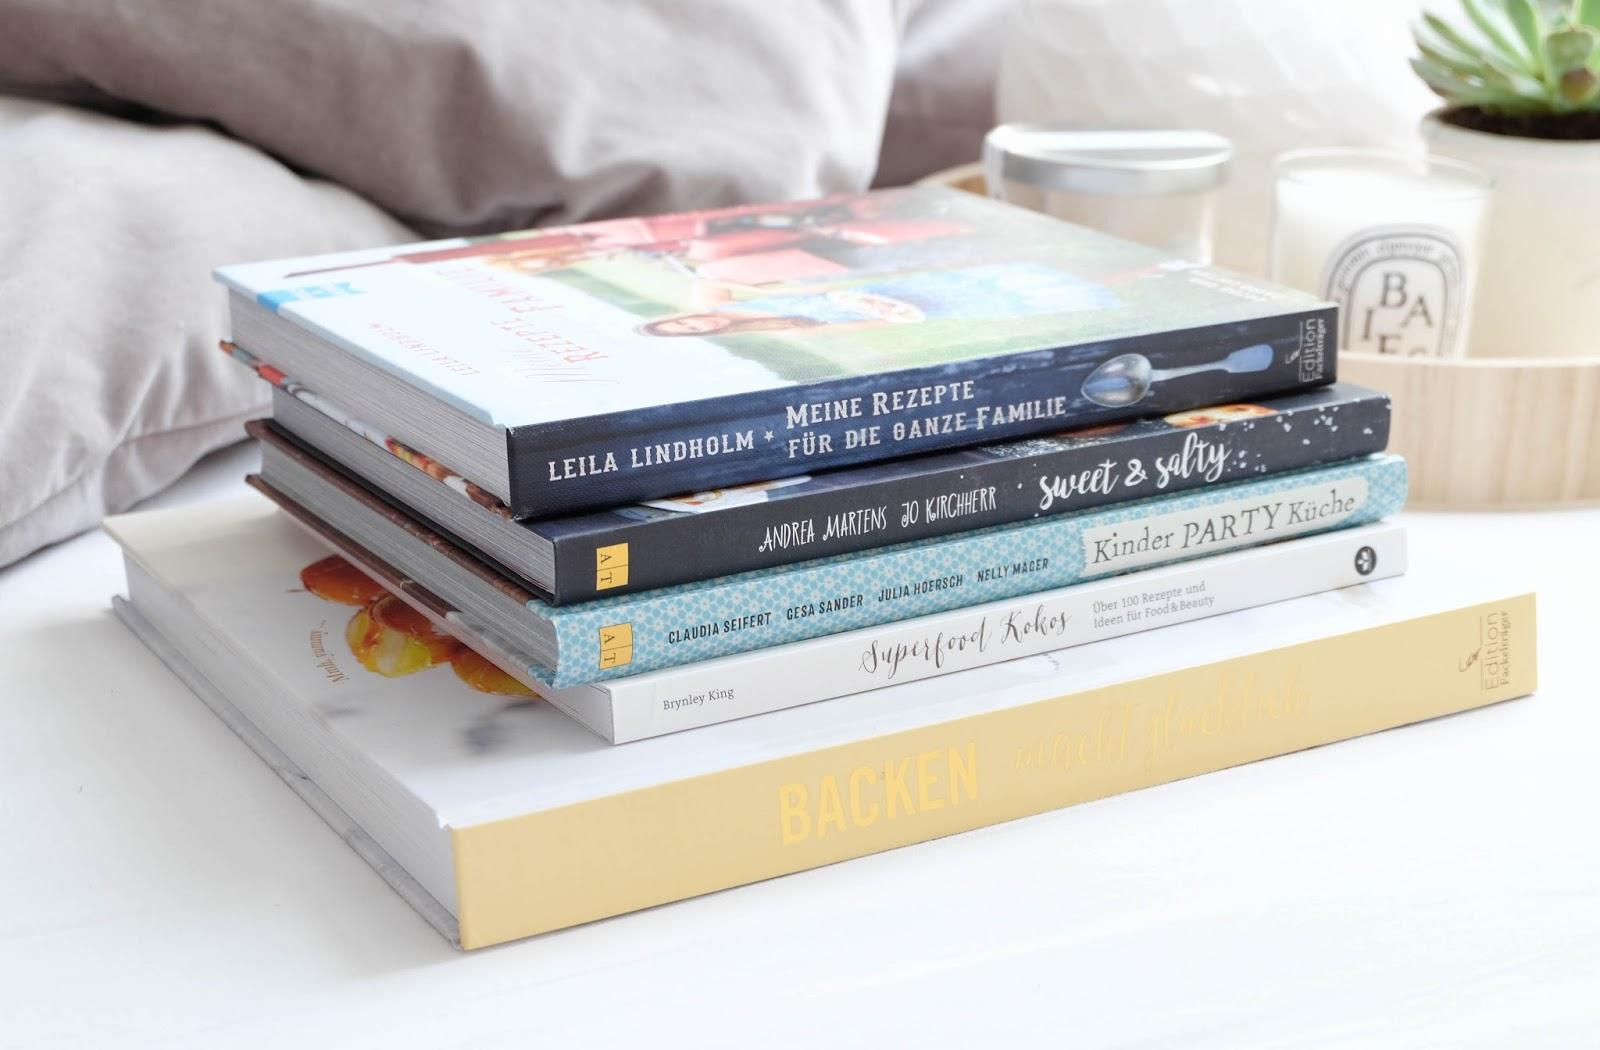 Koch- & backbücher  New books on the blog: Neue Koch- & Backbücher im Herbst ...